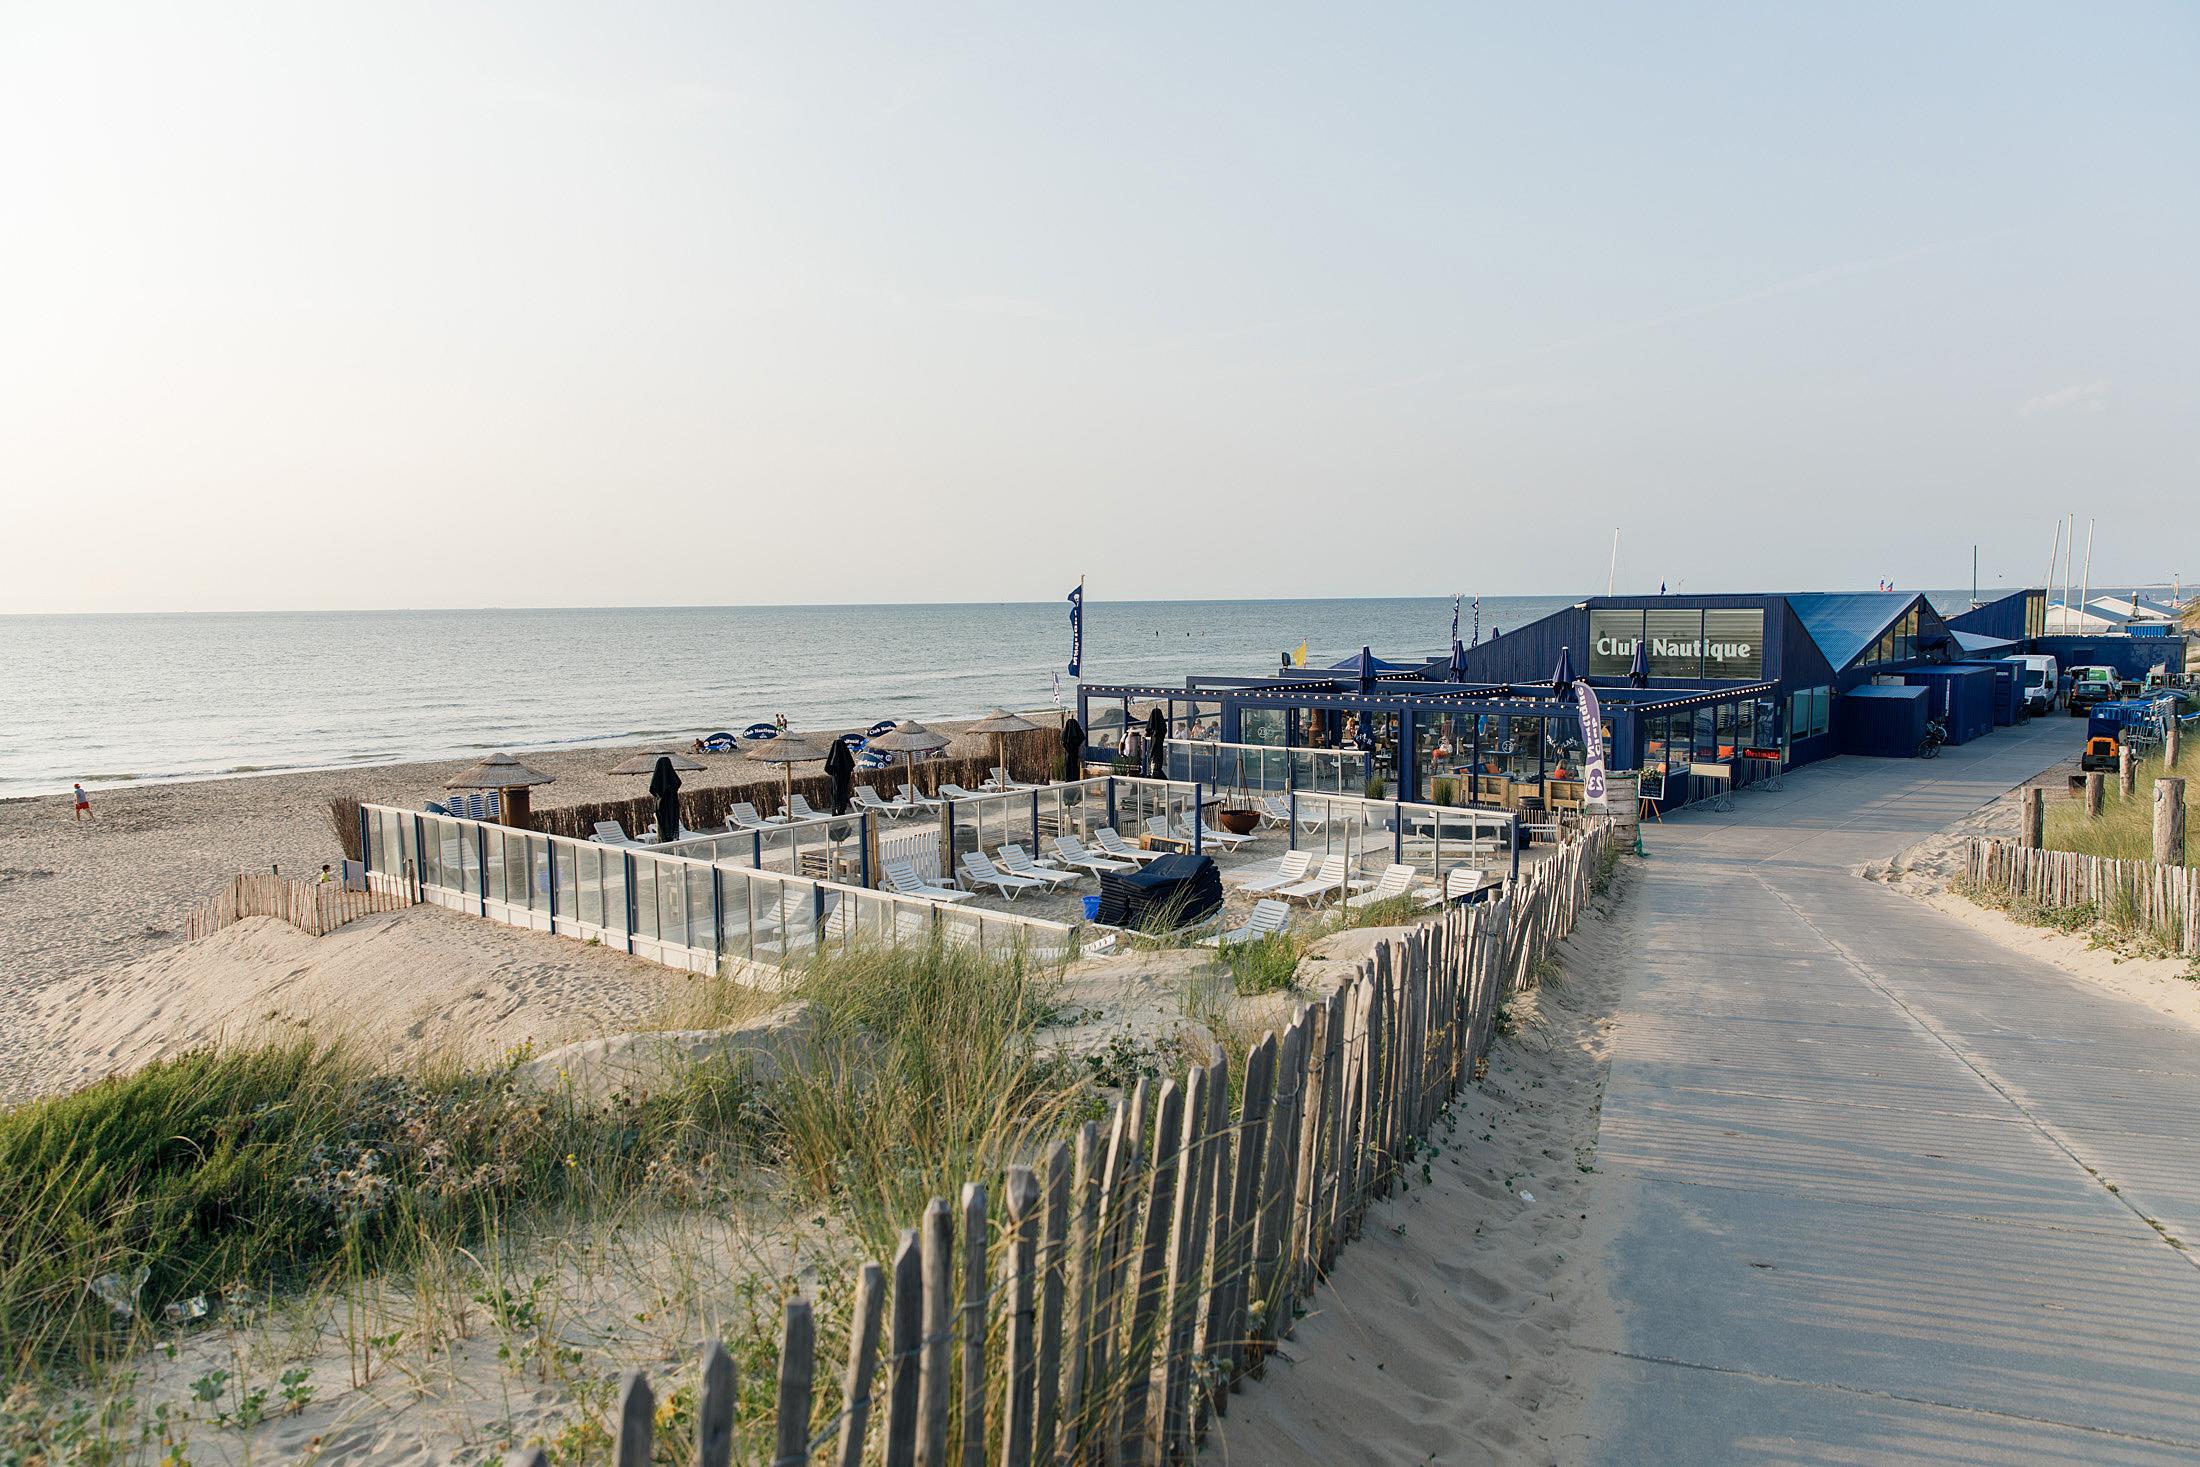 49-club-nautique-trouwlocatie-zandvoort